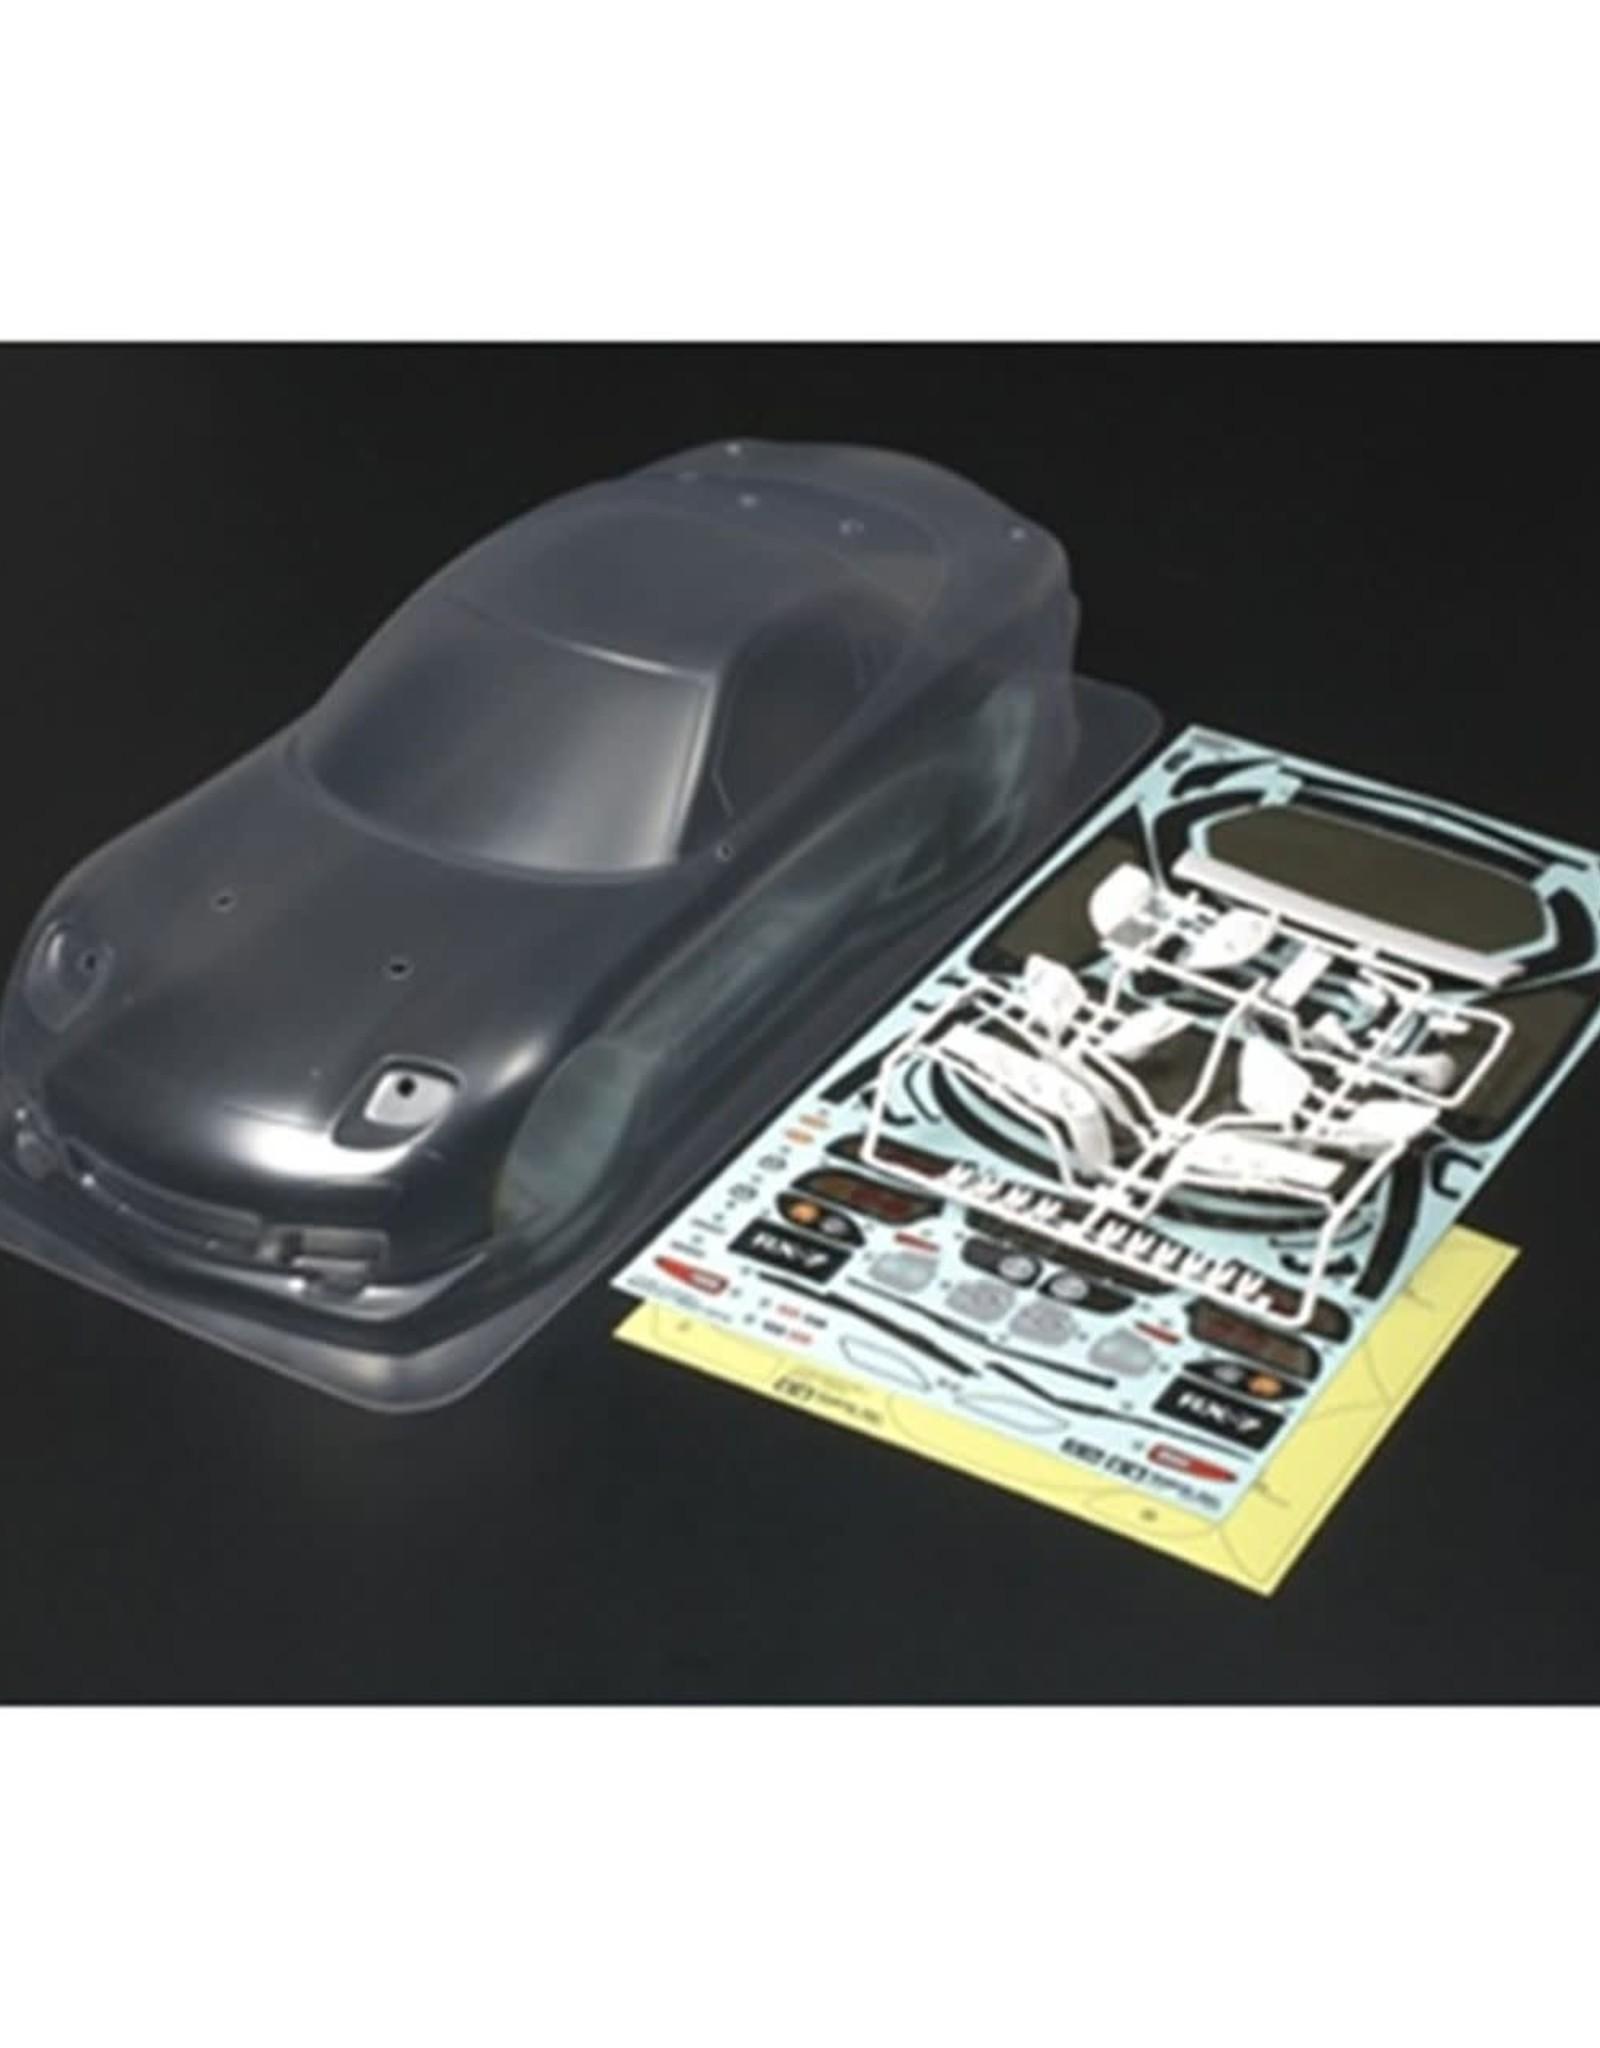 Tamiya Tamiya 1/10 Mazda RX-7 Body Parts Set TAM51270